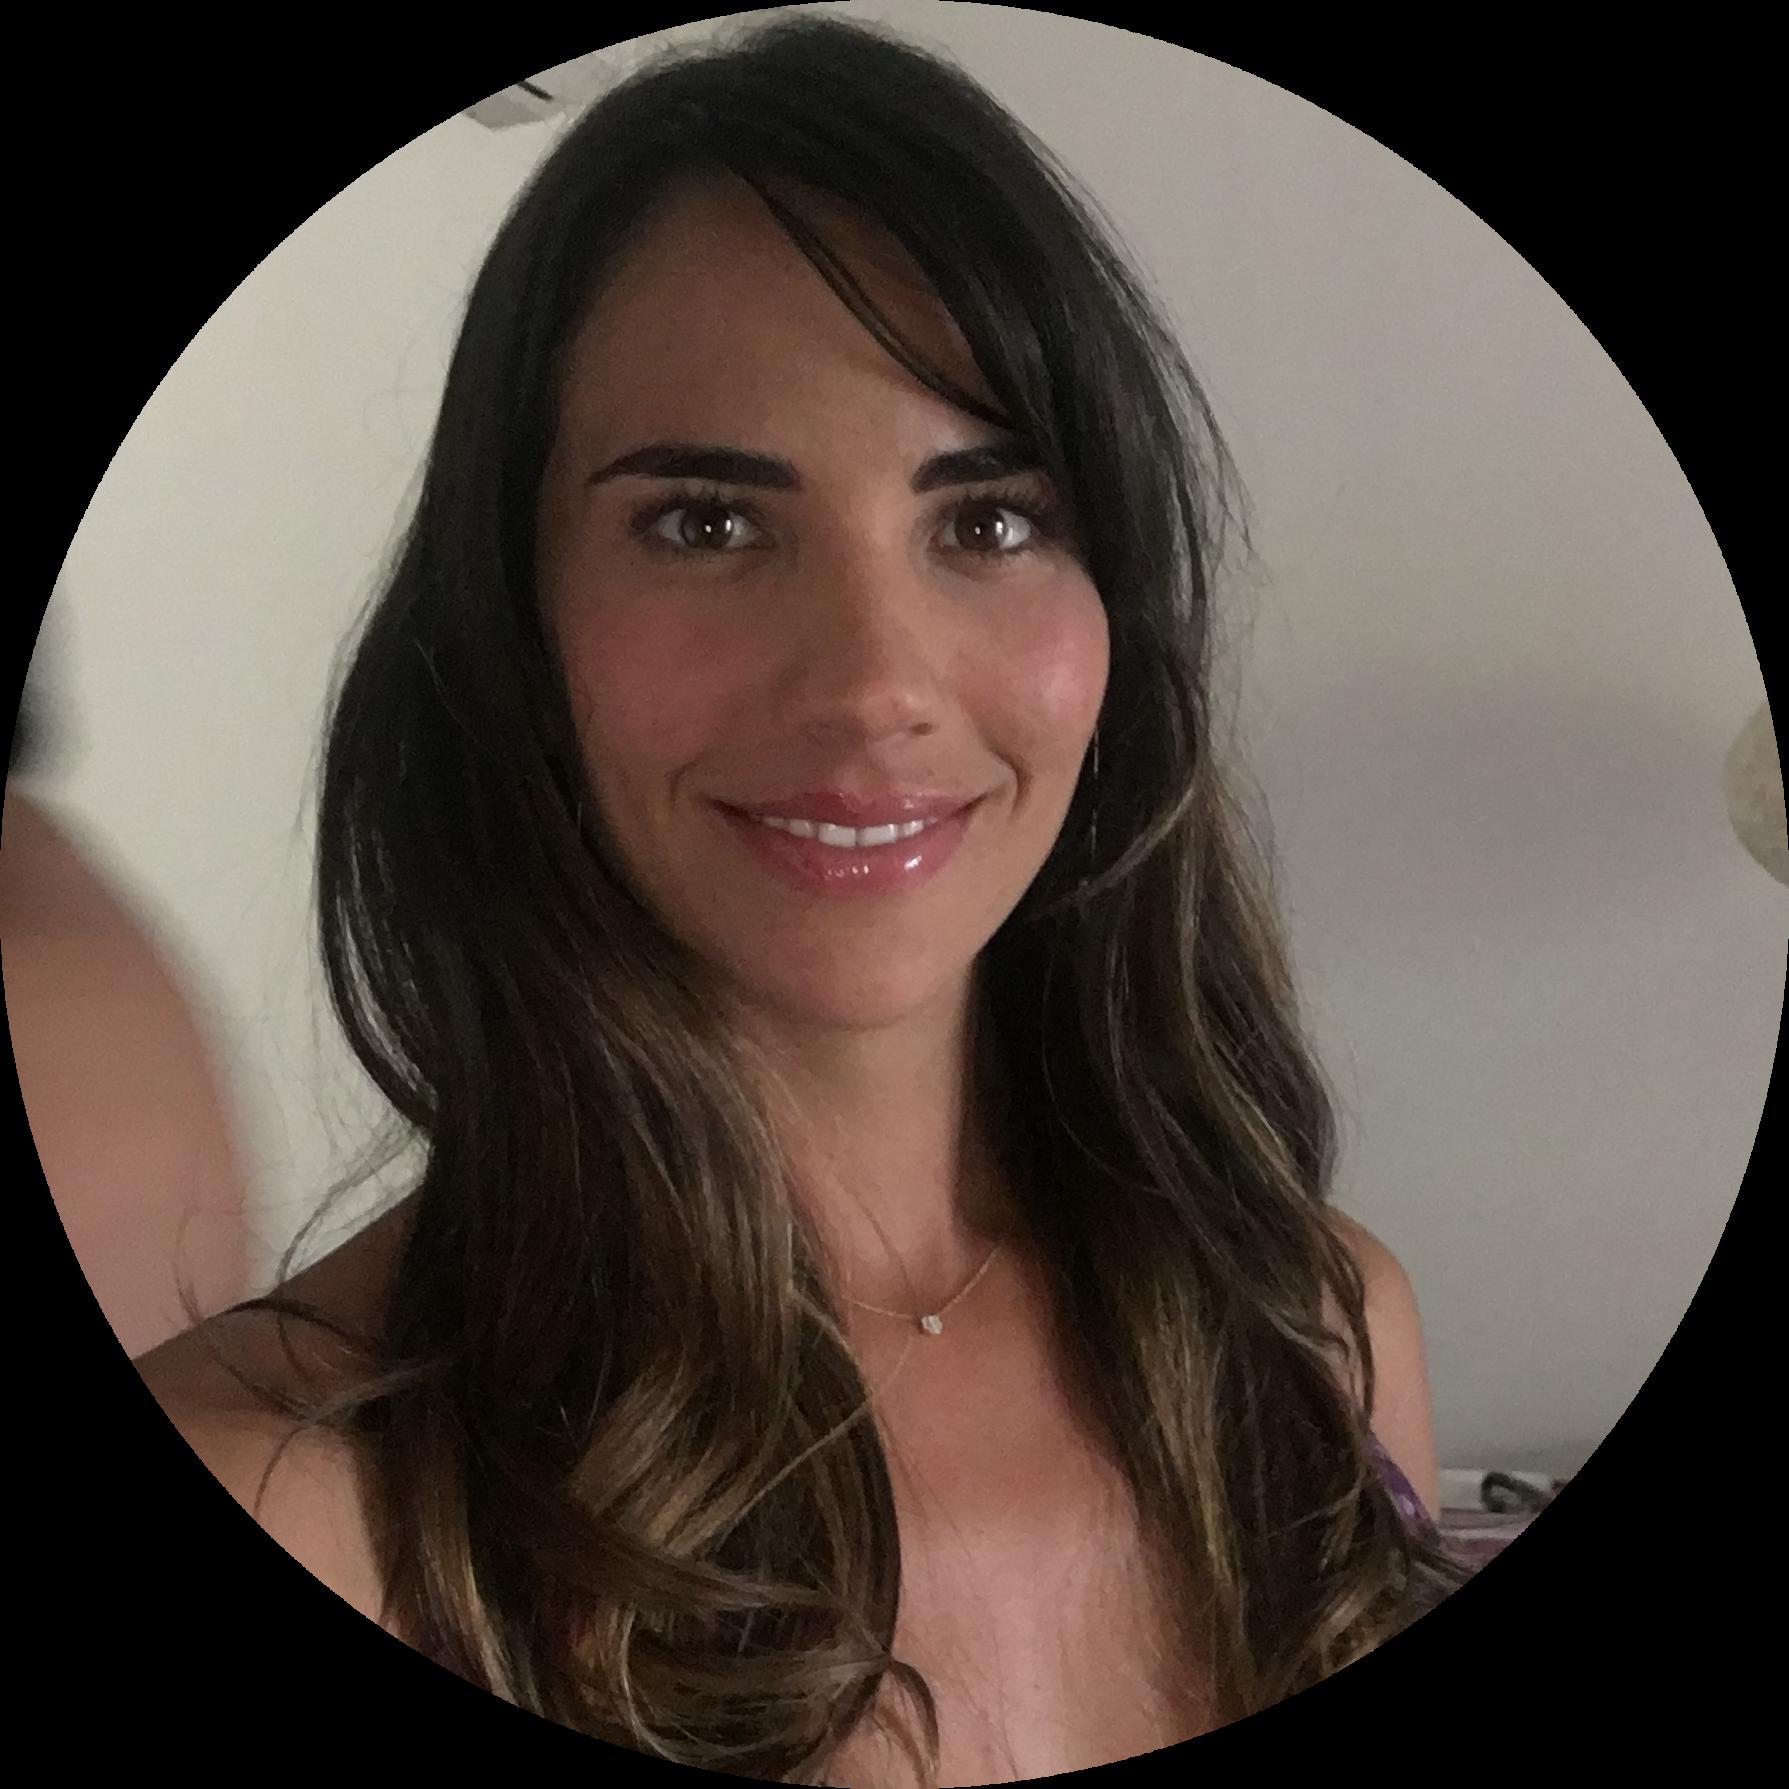 @Ana_arruda Profile Image   Linktree